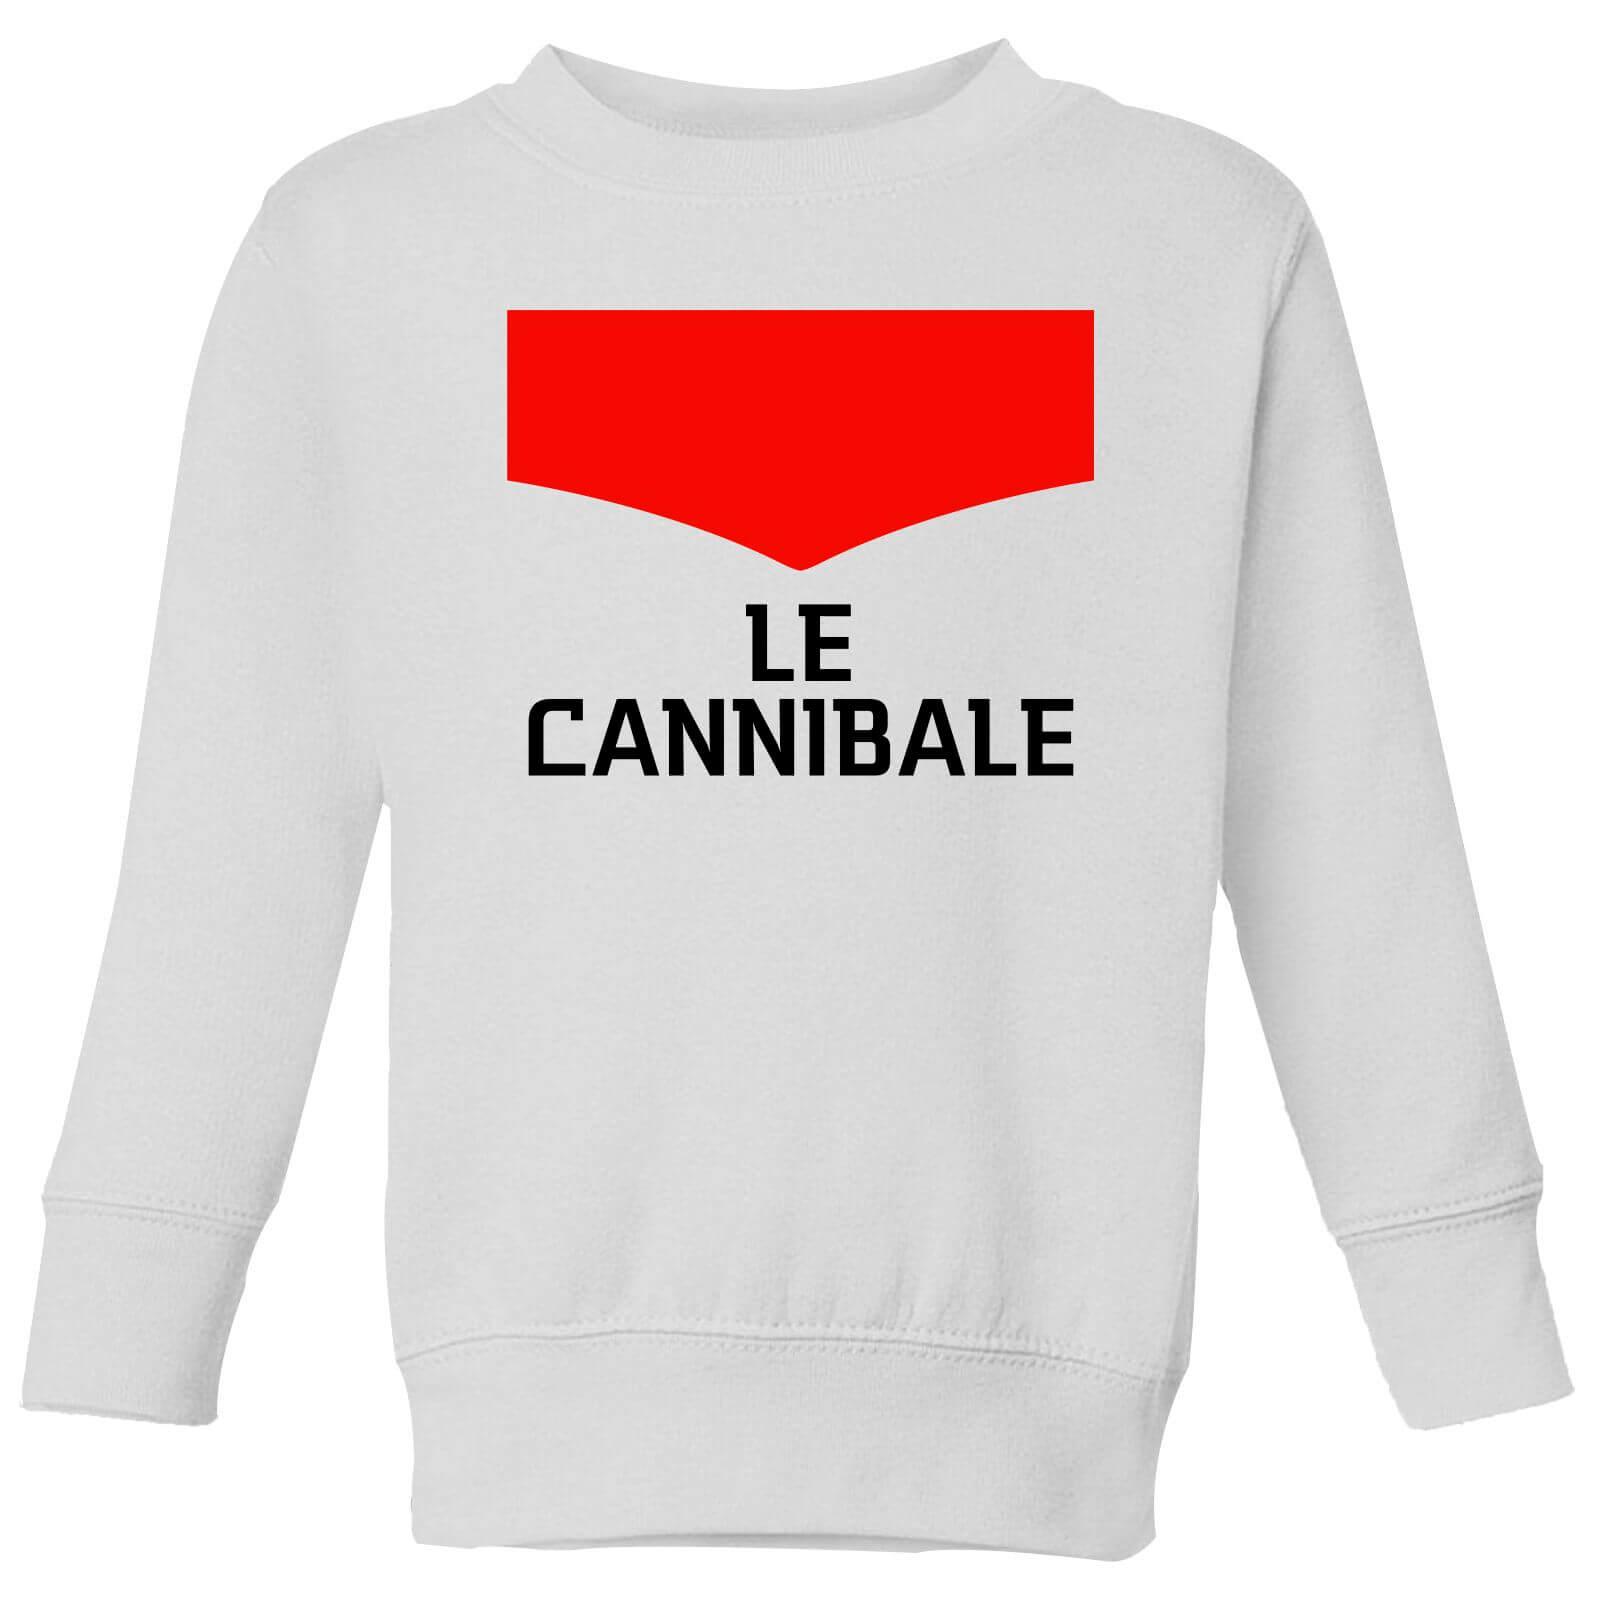 Summit Finish Le Cannibale Kids' Sweatshirt - White - 3-4 Years - White